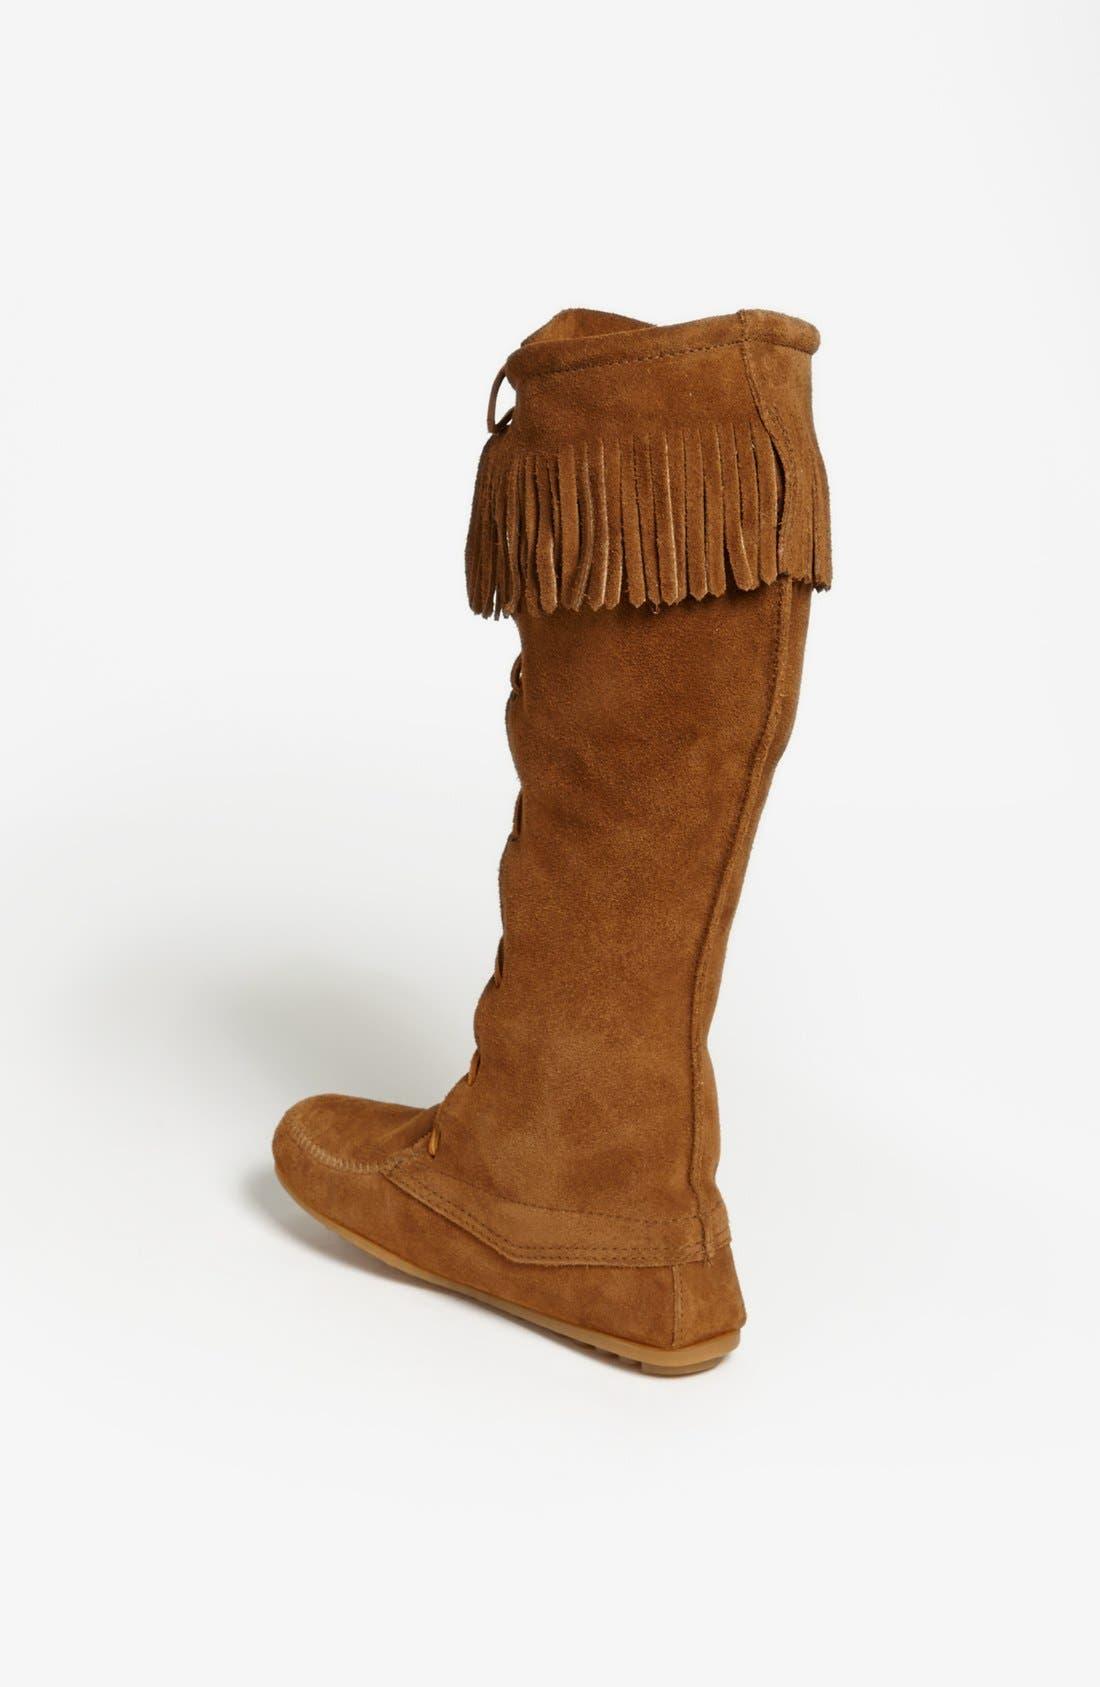 dd68bcdee5c2 Women s Flat Boots